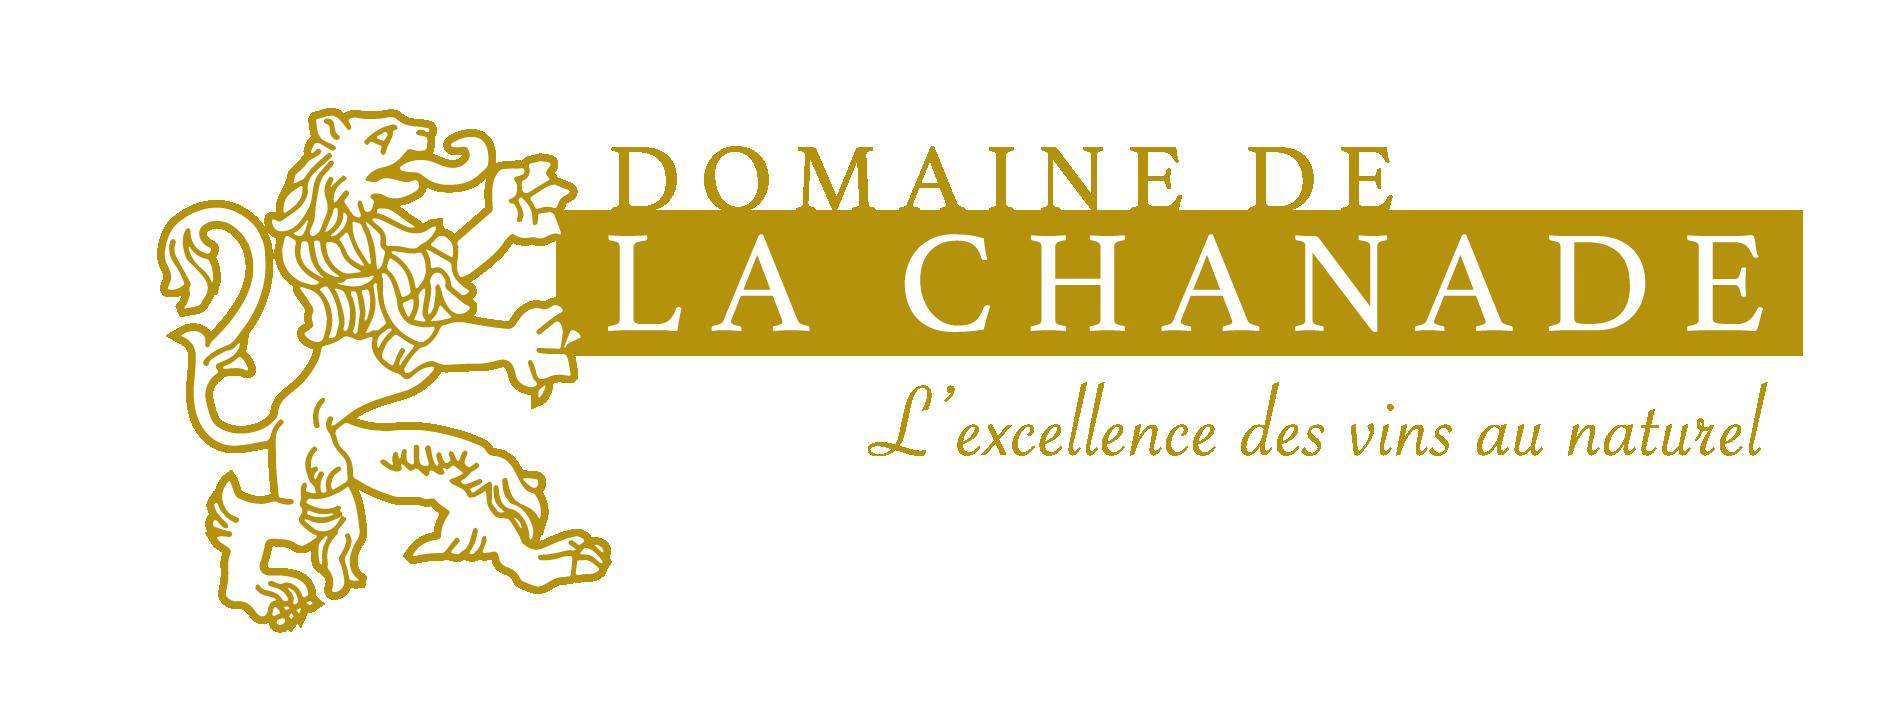 Domaine la Chanade